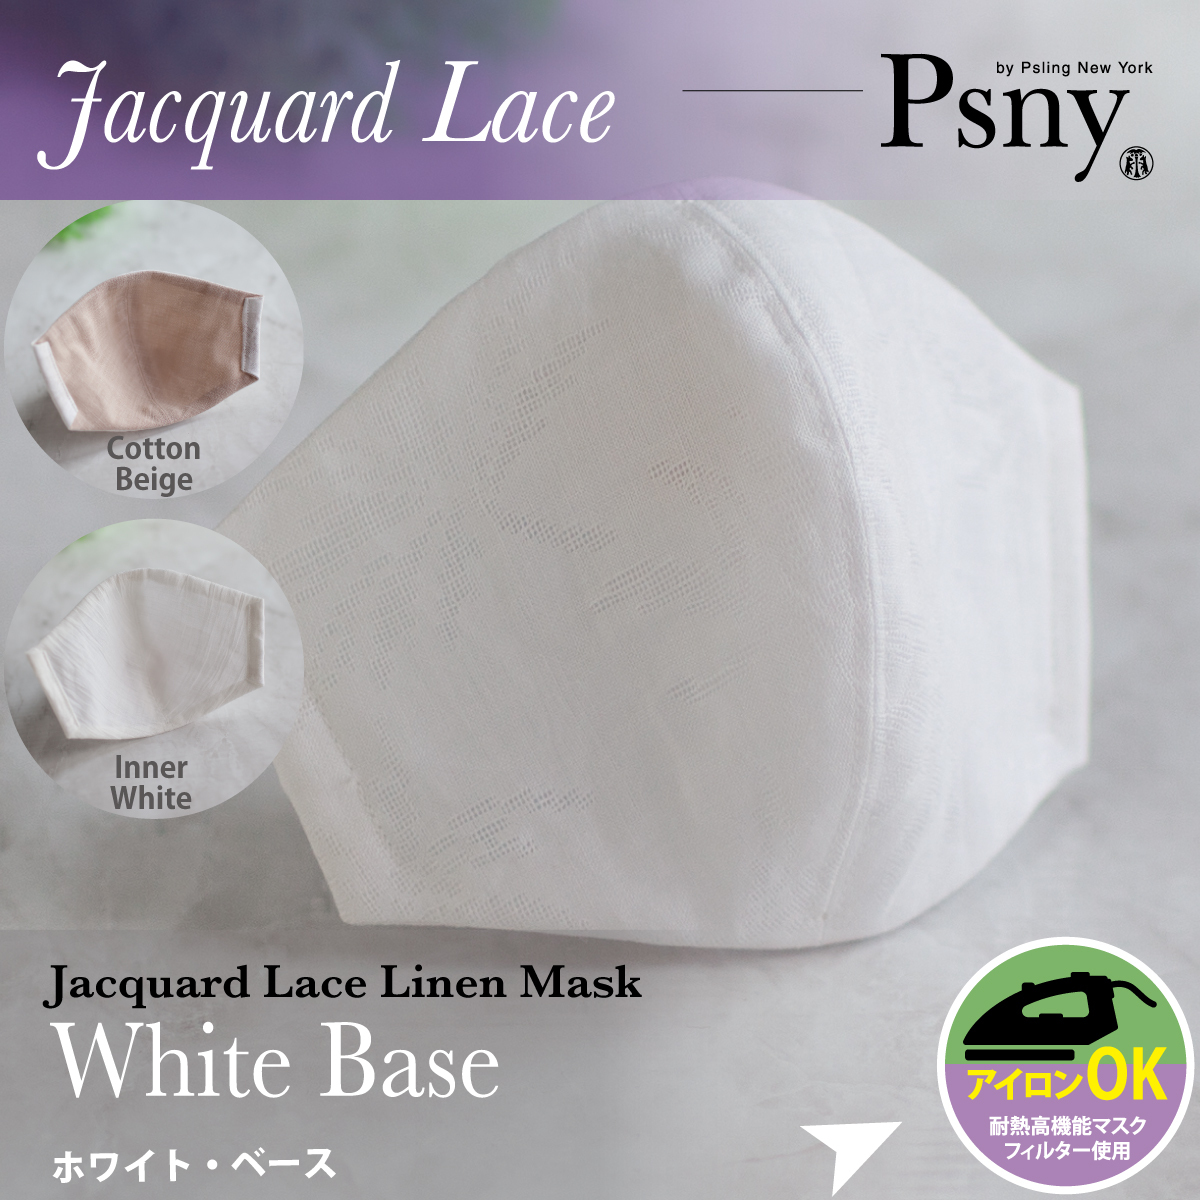 PSNY ジャガード リネン&ホワイト 花粉 黄砂 洗える不織布フィルター入り 立体 大人用 マスク 送料無料 P20